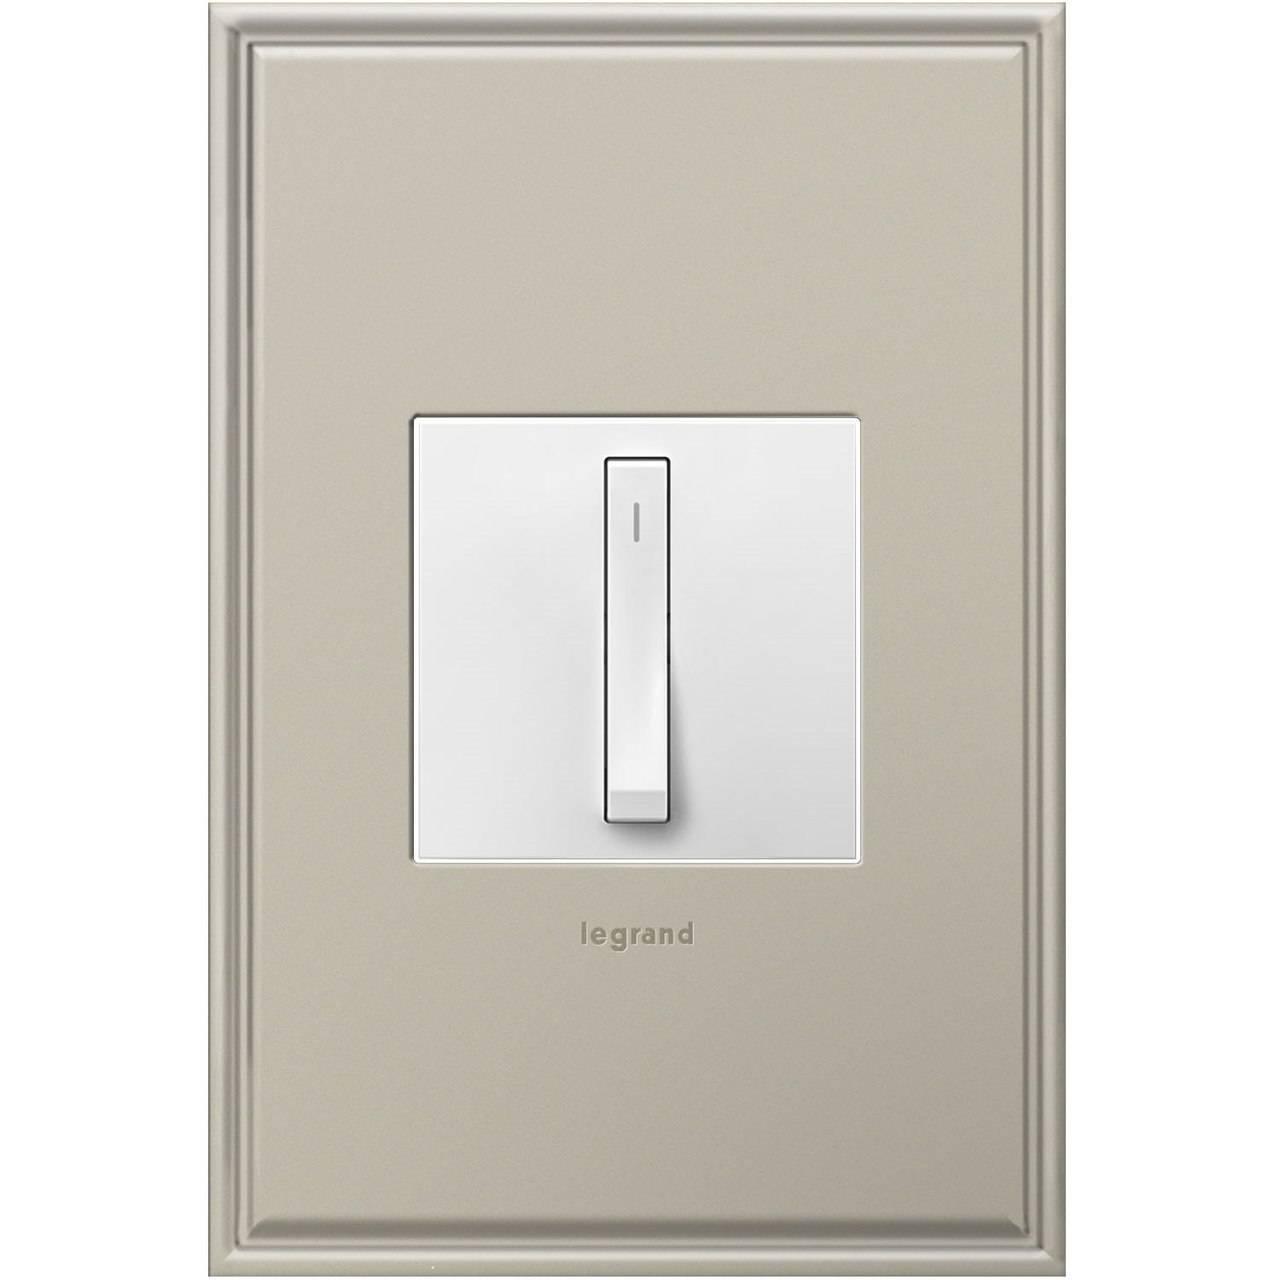 Legrand adorne wi-fi ready master whisper dimmer switch tru-universal